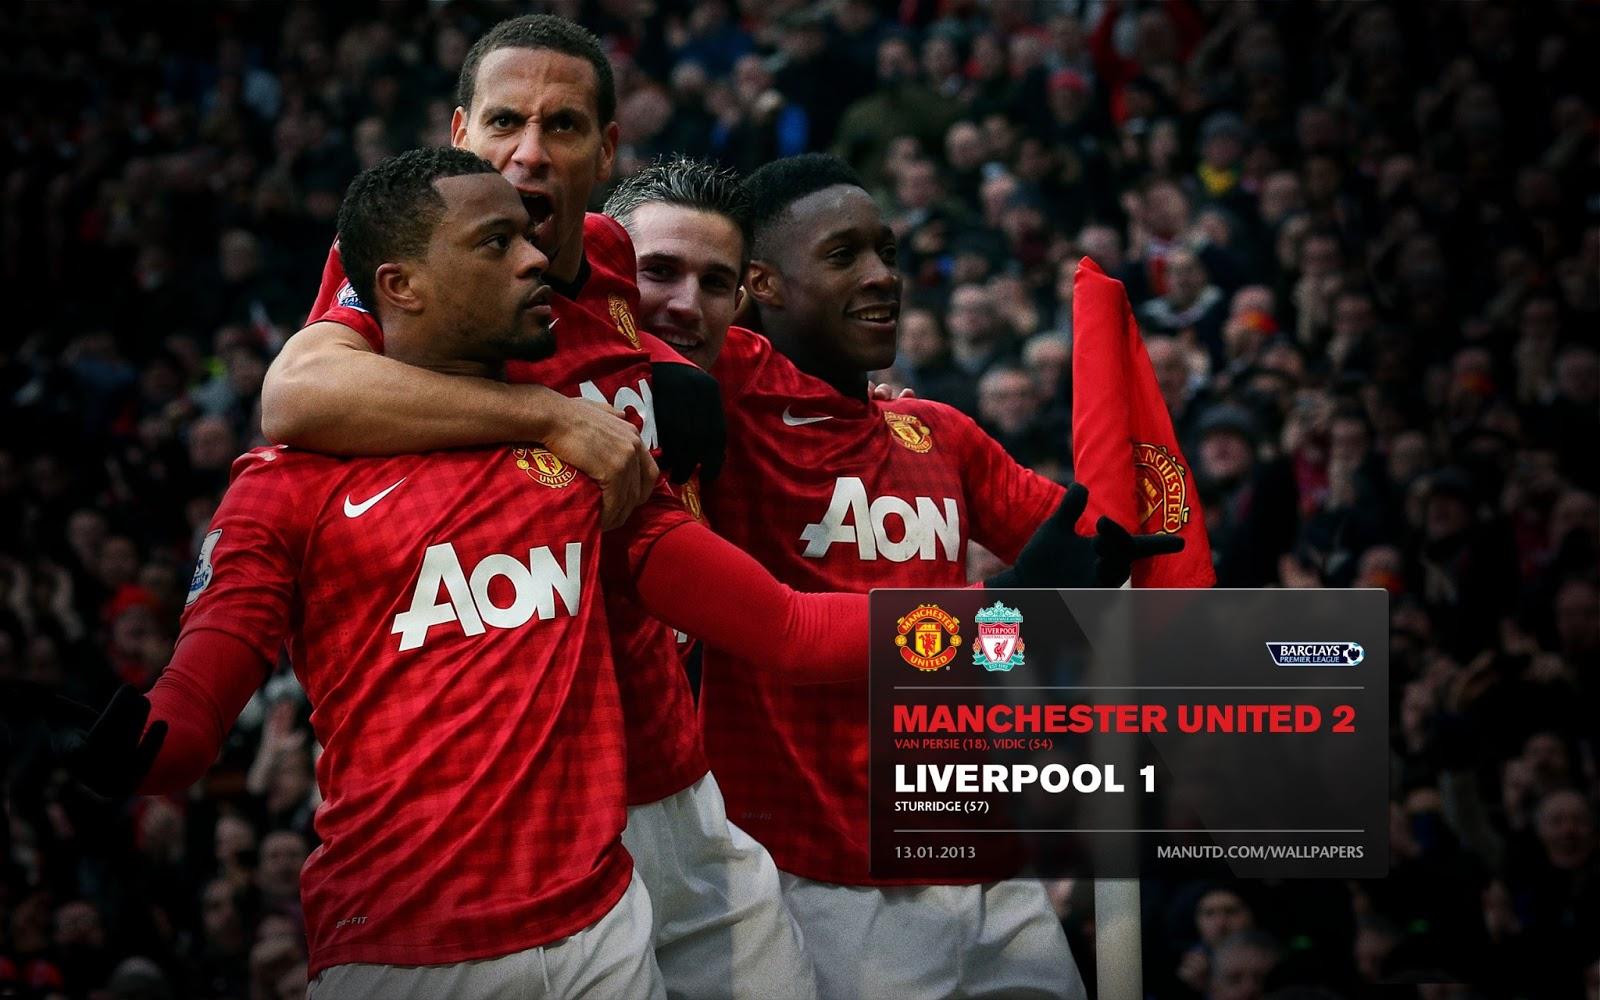 http://1.bp.blogspot.com/-x8Y7MuwG9B4/UT8Iyyc4HnI/AAAAAAAALEs/vNmWabFE-U4/s1600/Match_Liverpool_H.jpg